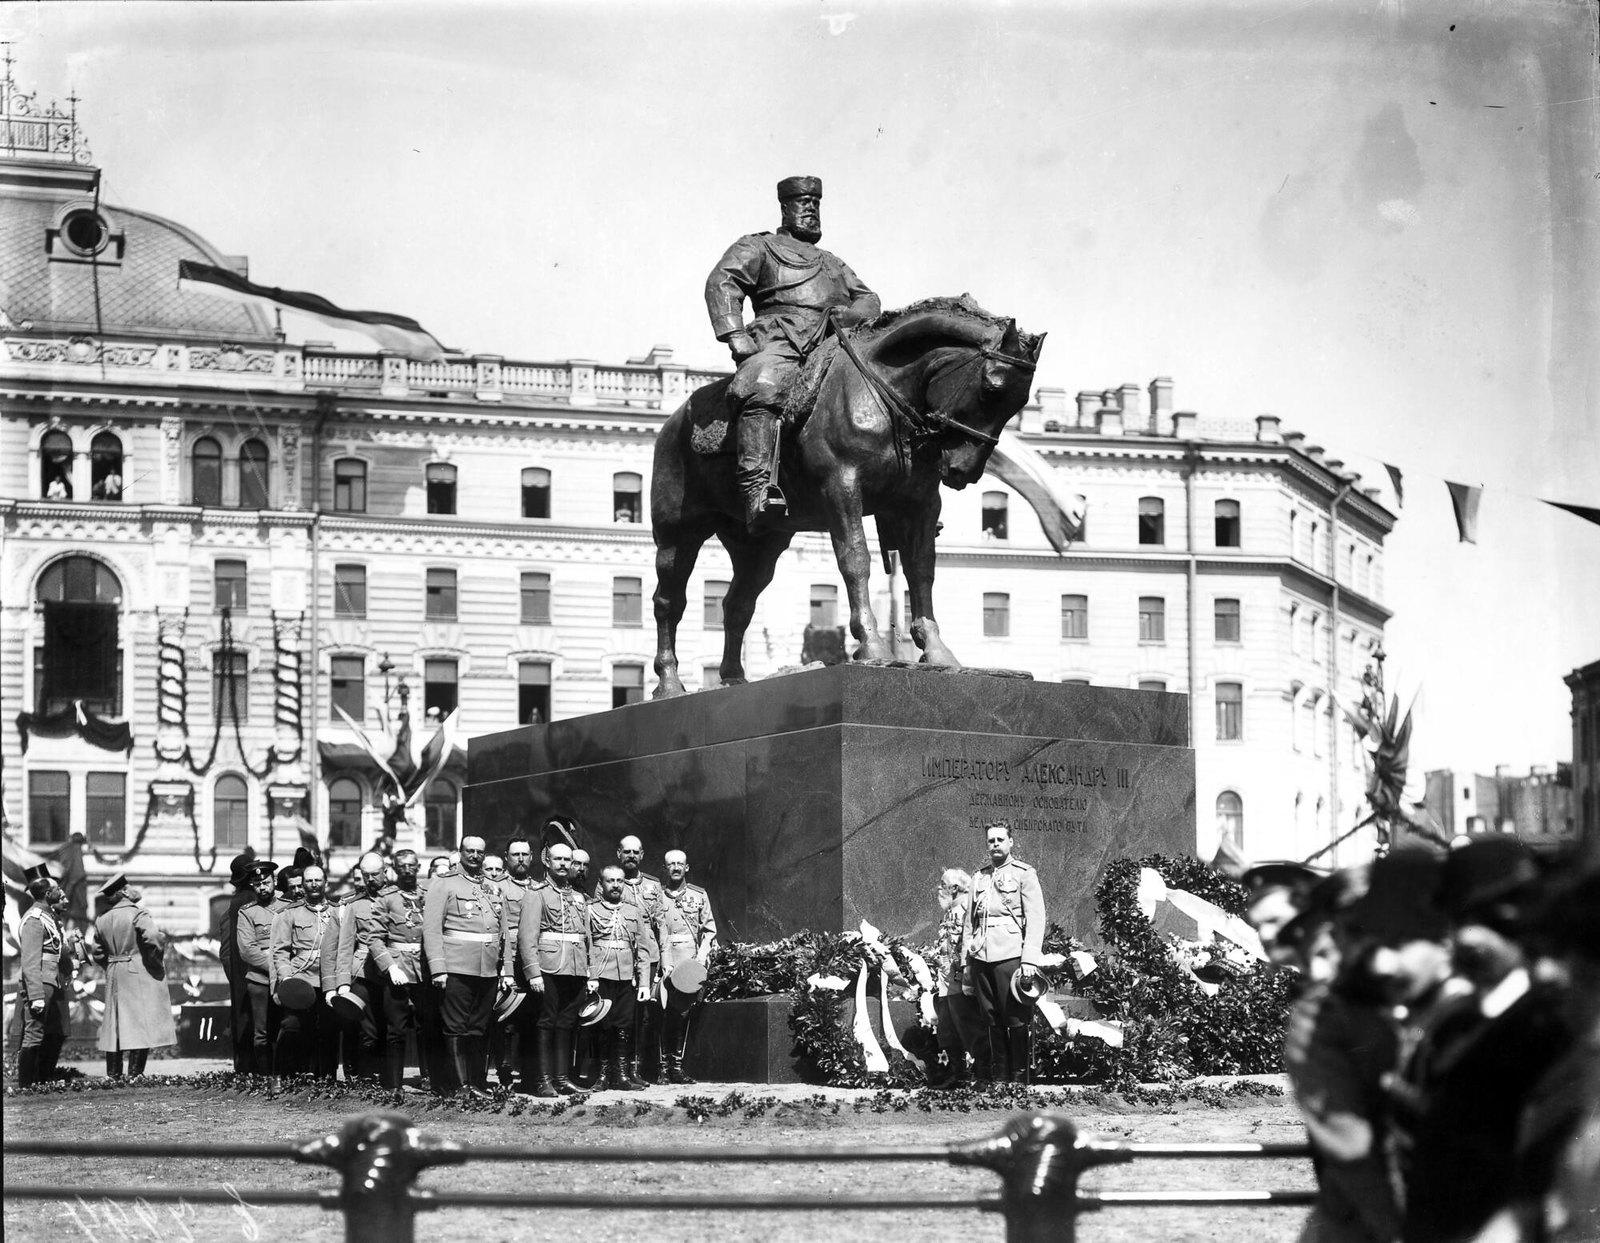 1909 Депутация лейб-гвардии Преображенского полка на открытии памятника Александру III